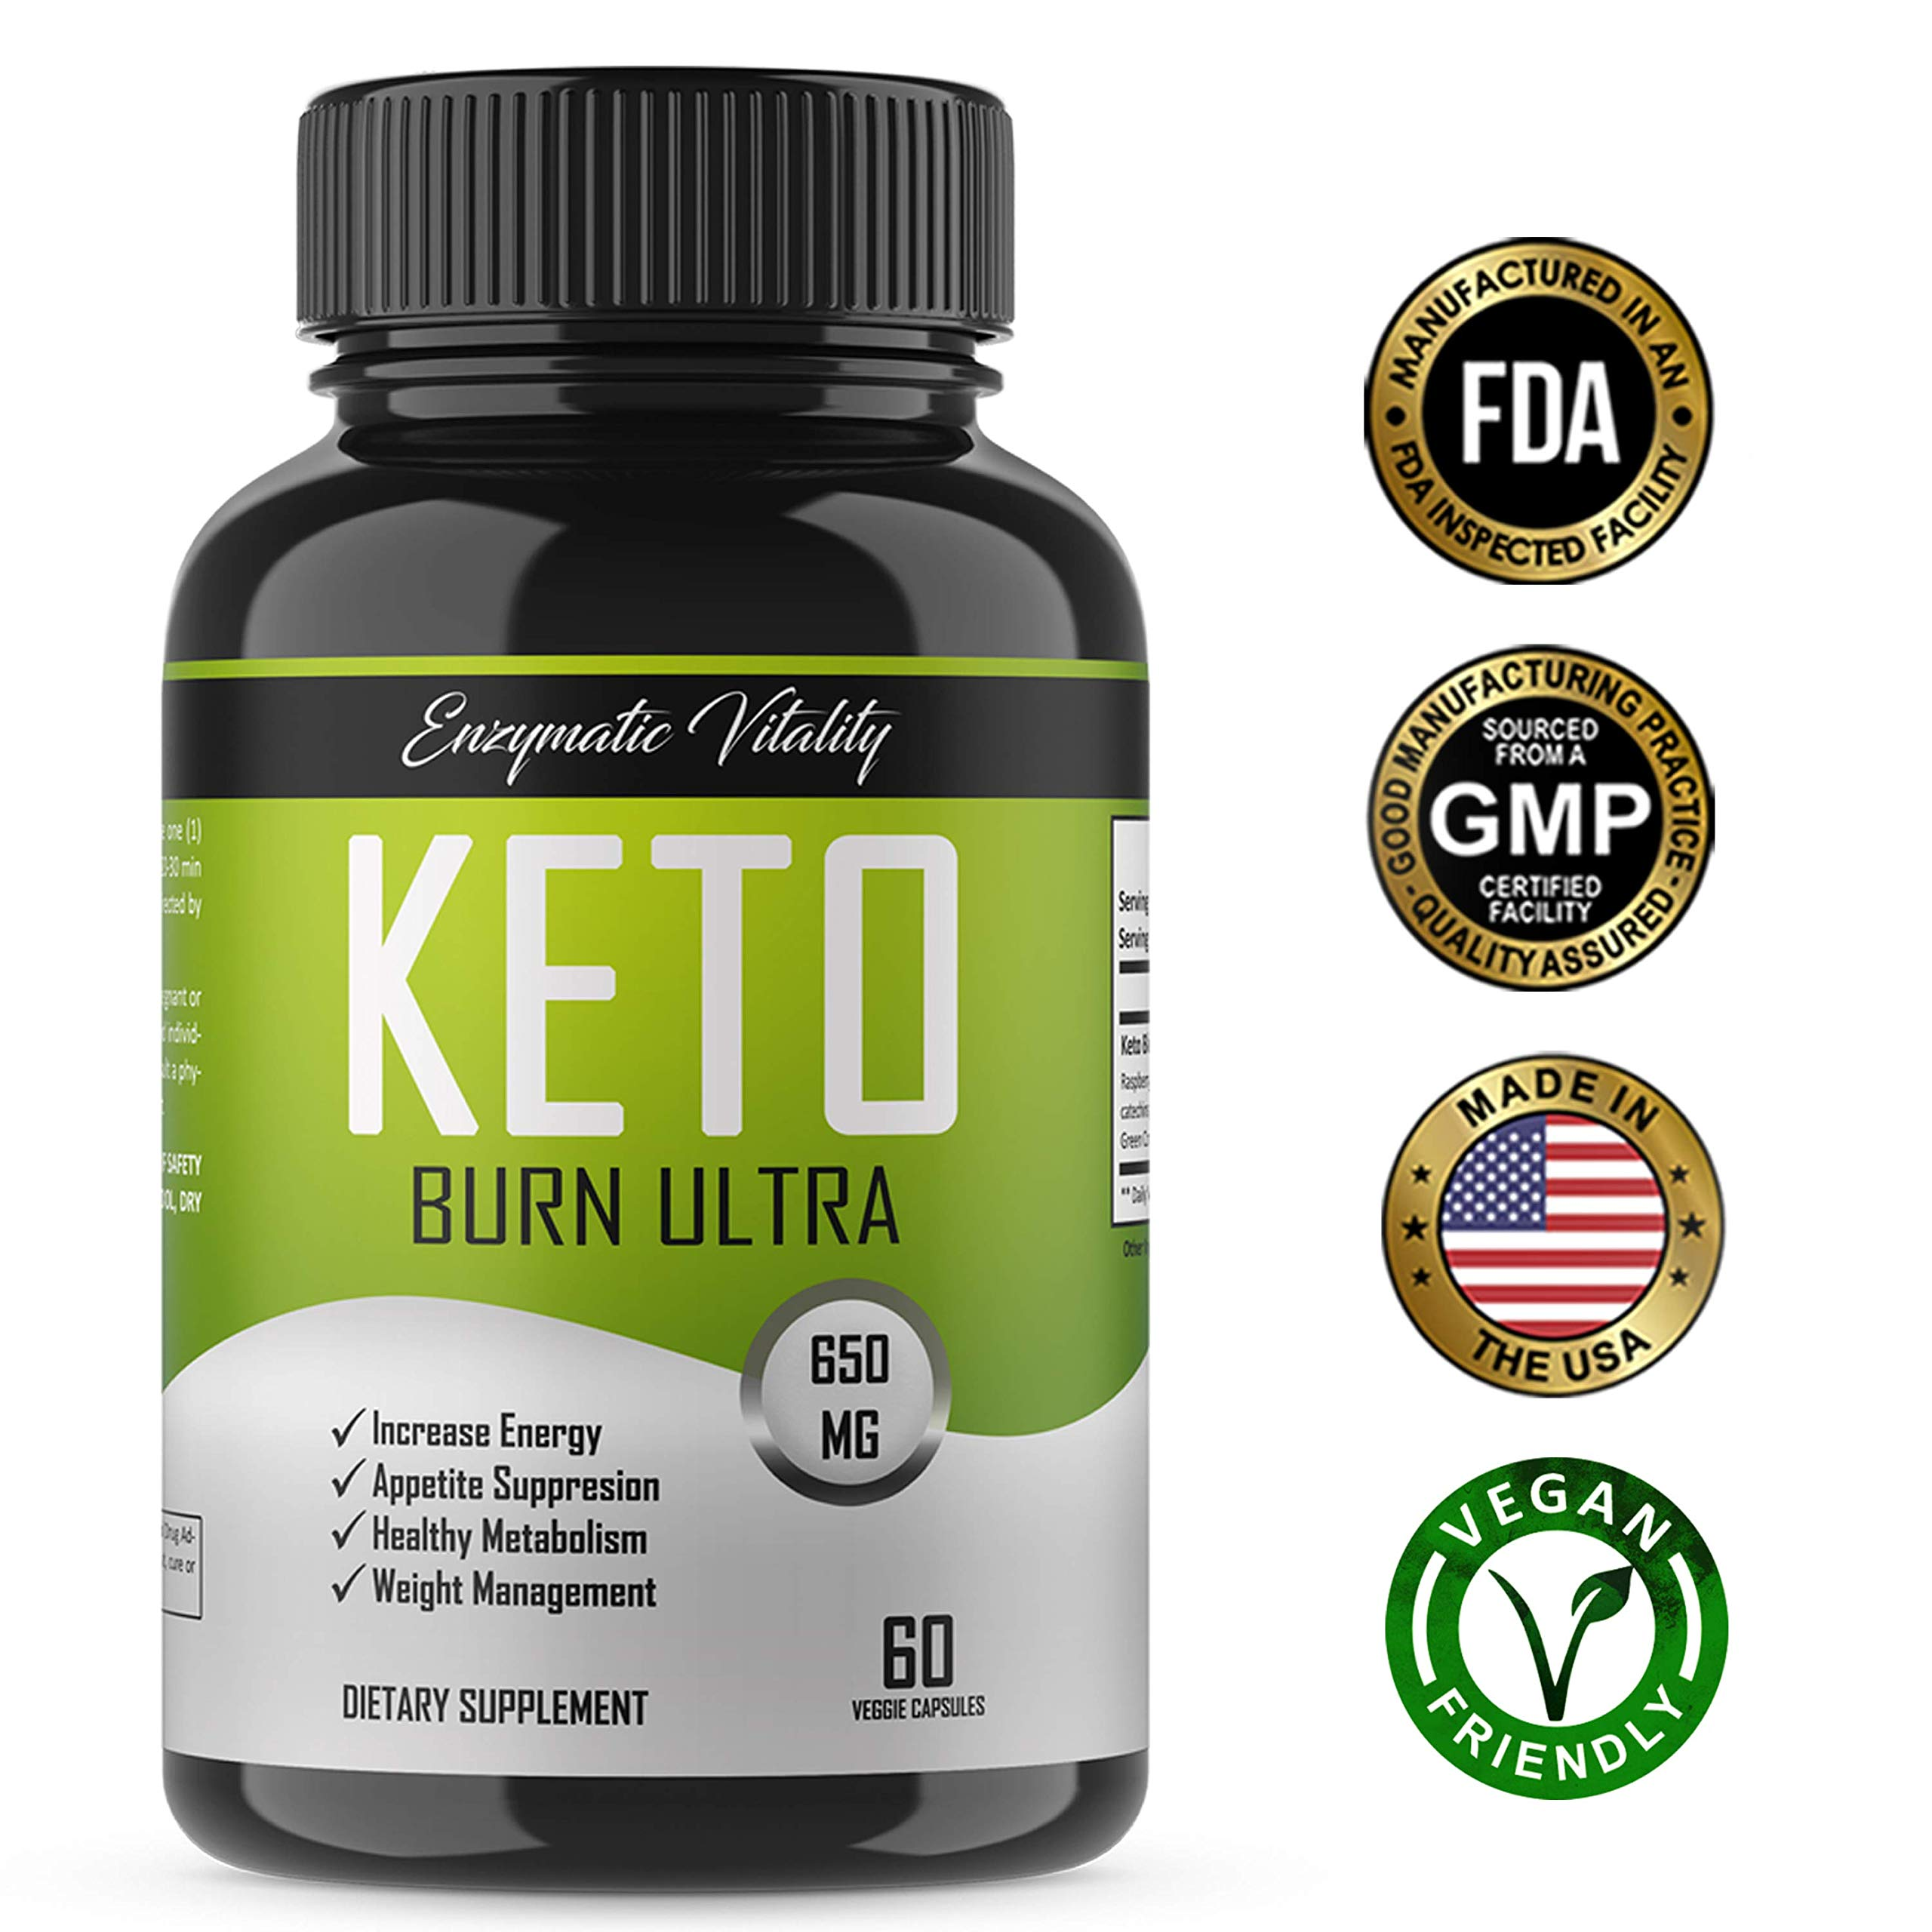 Keto Burn - All Natural Keto Diet Pills - Ketogenic Fat Burner, Vegan Friendly Weight Loss Pills with Antioxidants- Maintain Ketosis, Appetite Suppressant, Energy & Mental Clarity -Burn Fat Non GMO